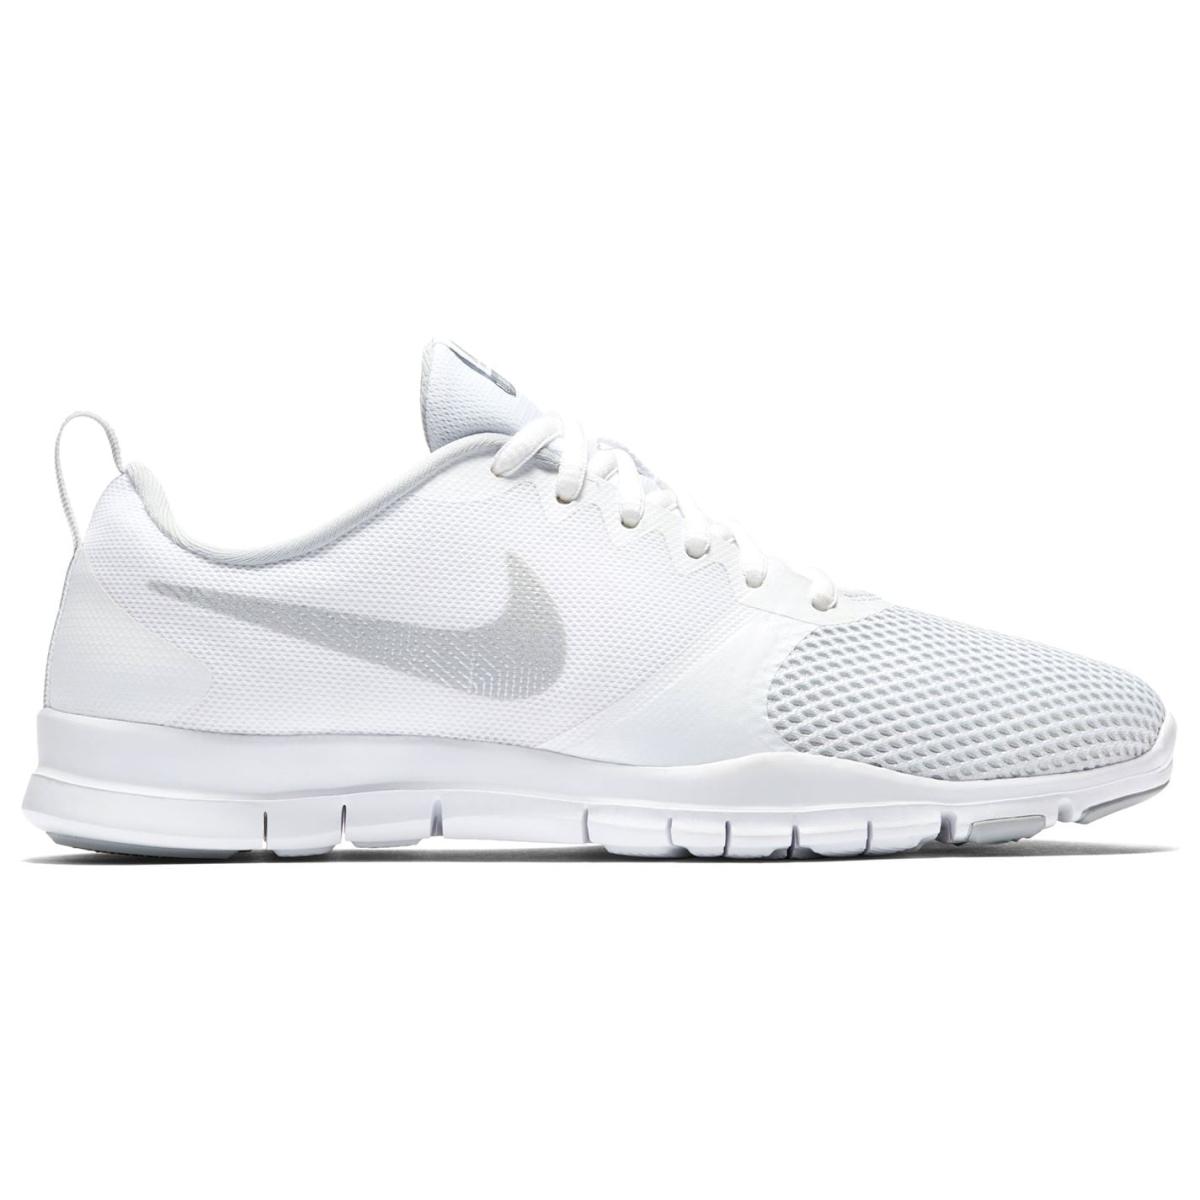 Nike-Flex-Laufschuhe-Turnschuhe-Damen-Sneaker-Sportschuhe-Jogging-3088 Indexbild 28